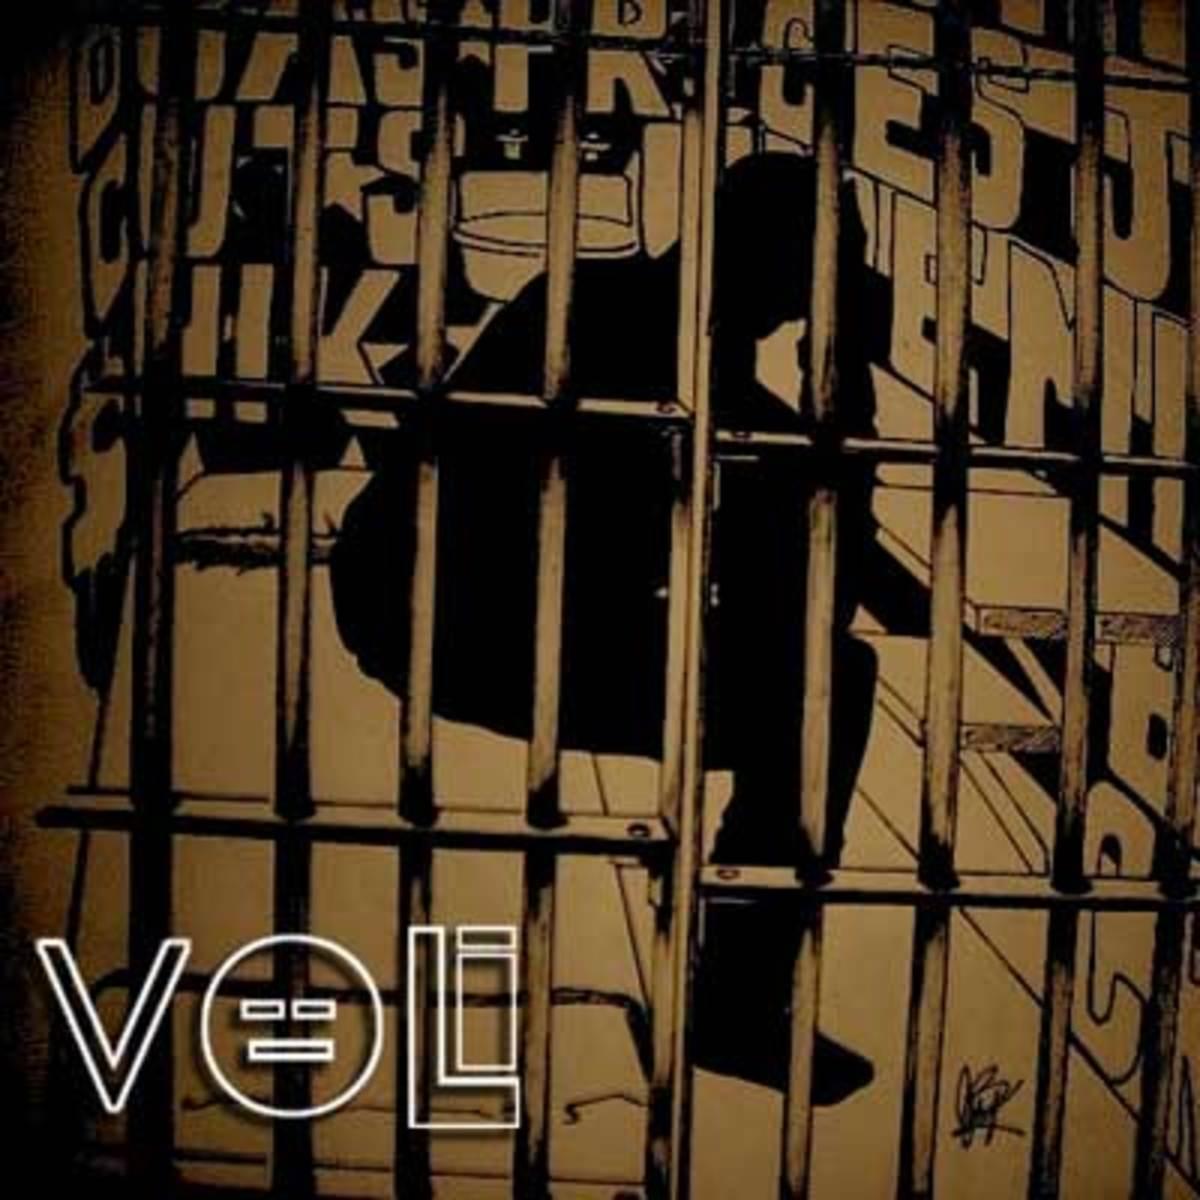 voli-prisonor.jpg